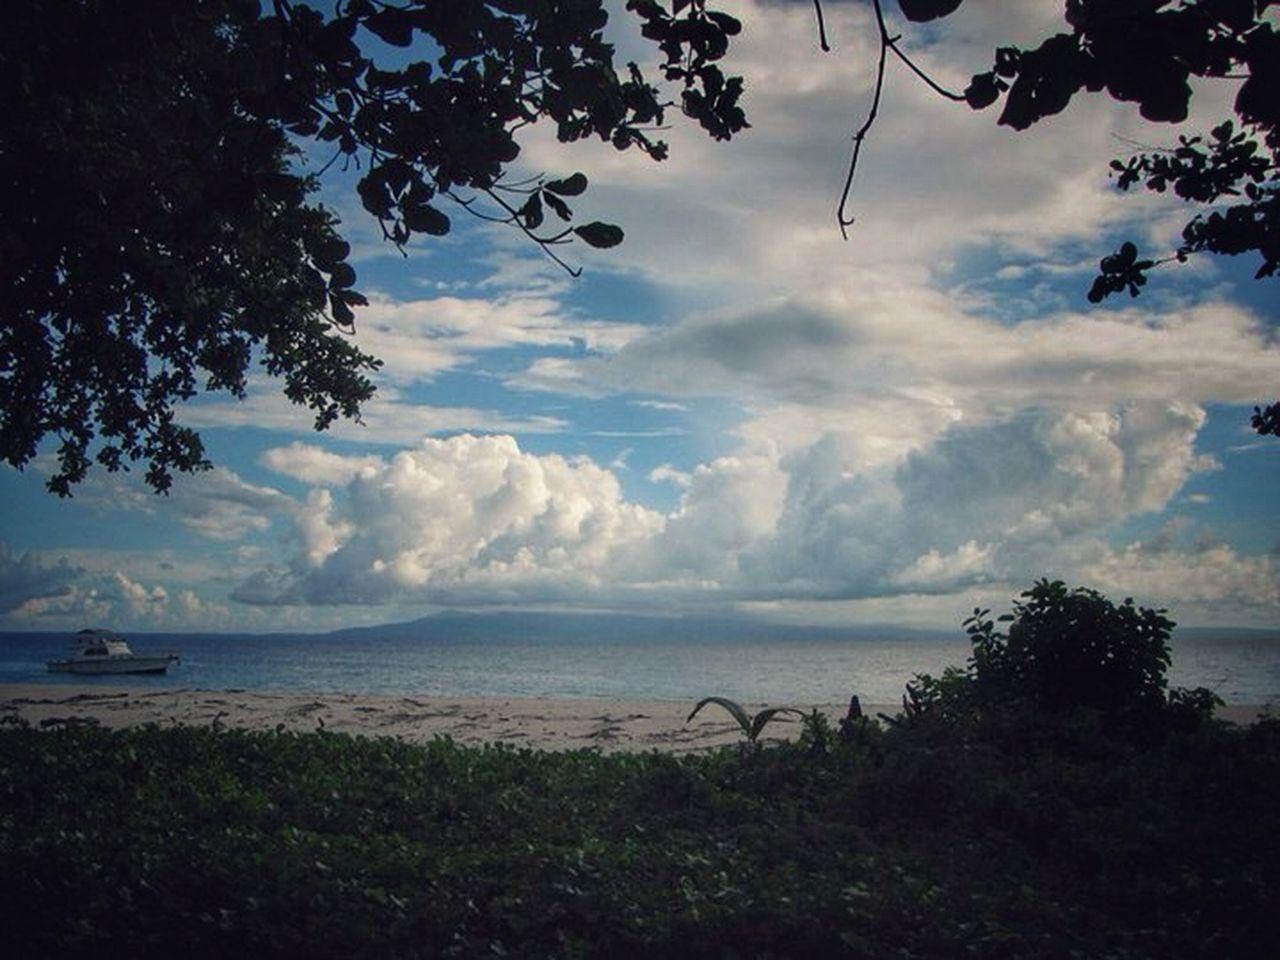 Deli Nature Sea Iphonephotography Blackdrawing Iphonesia Iphoneonly EyeEm Naturelovers Taking Photos Beach